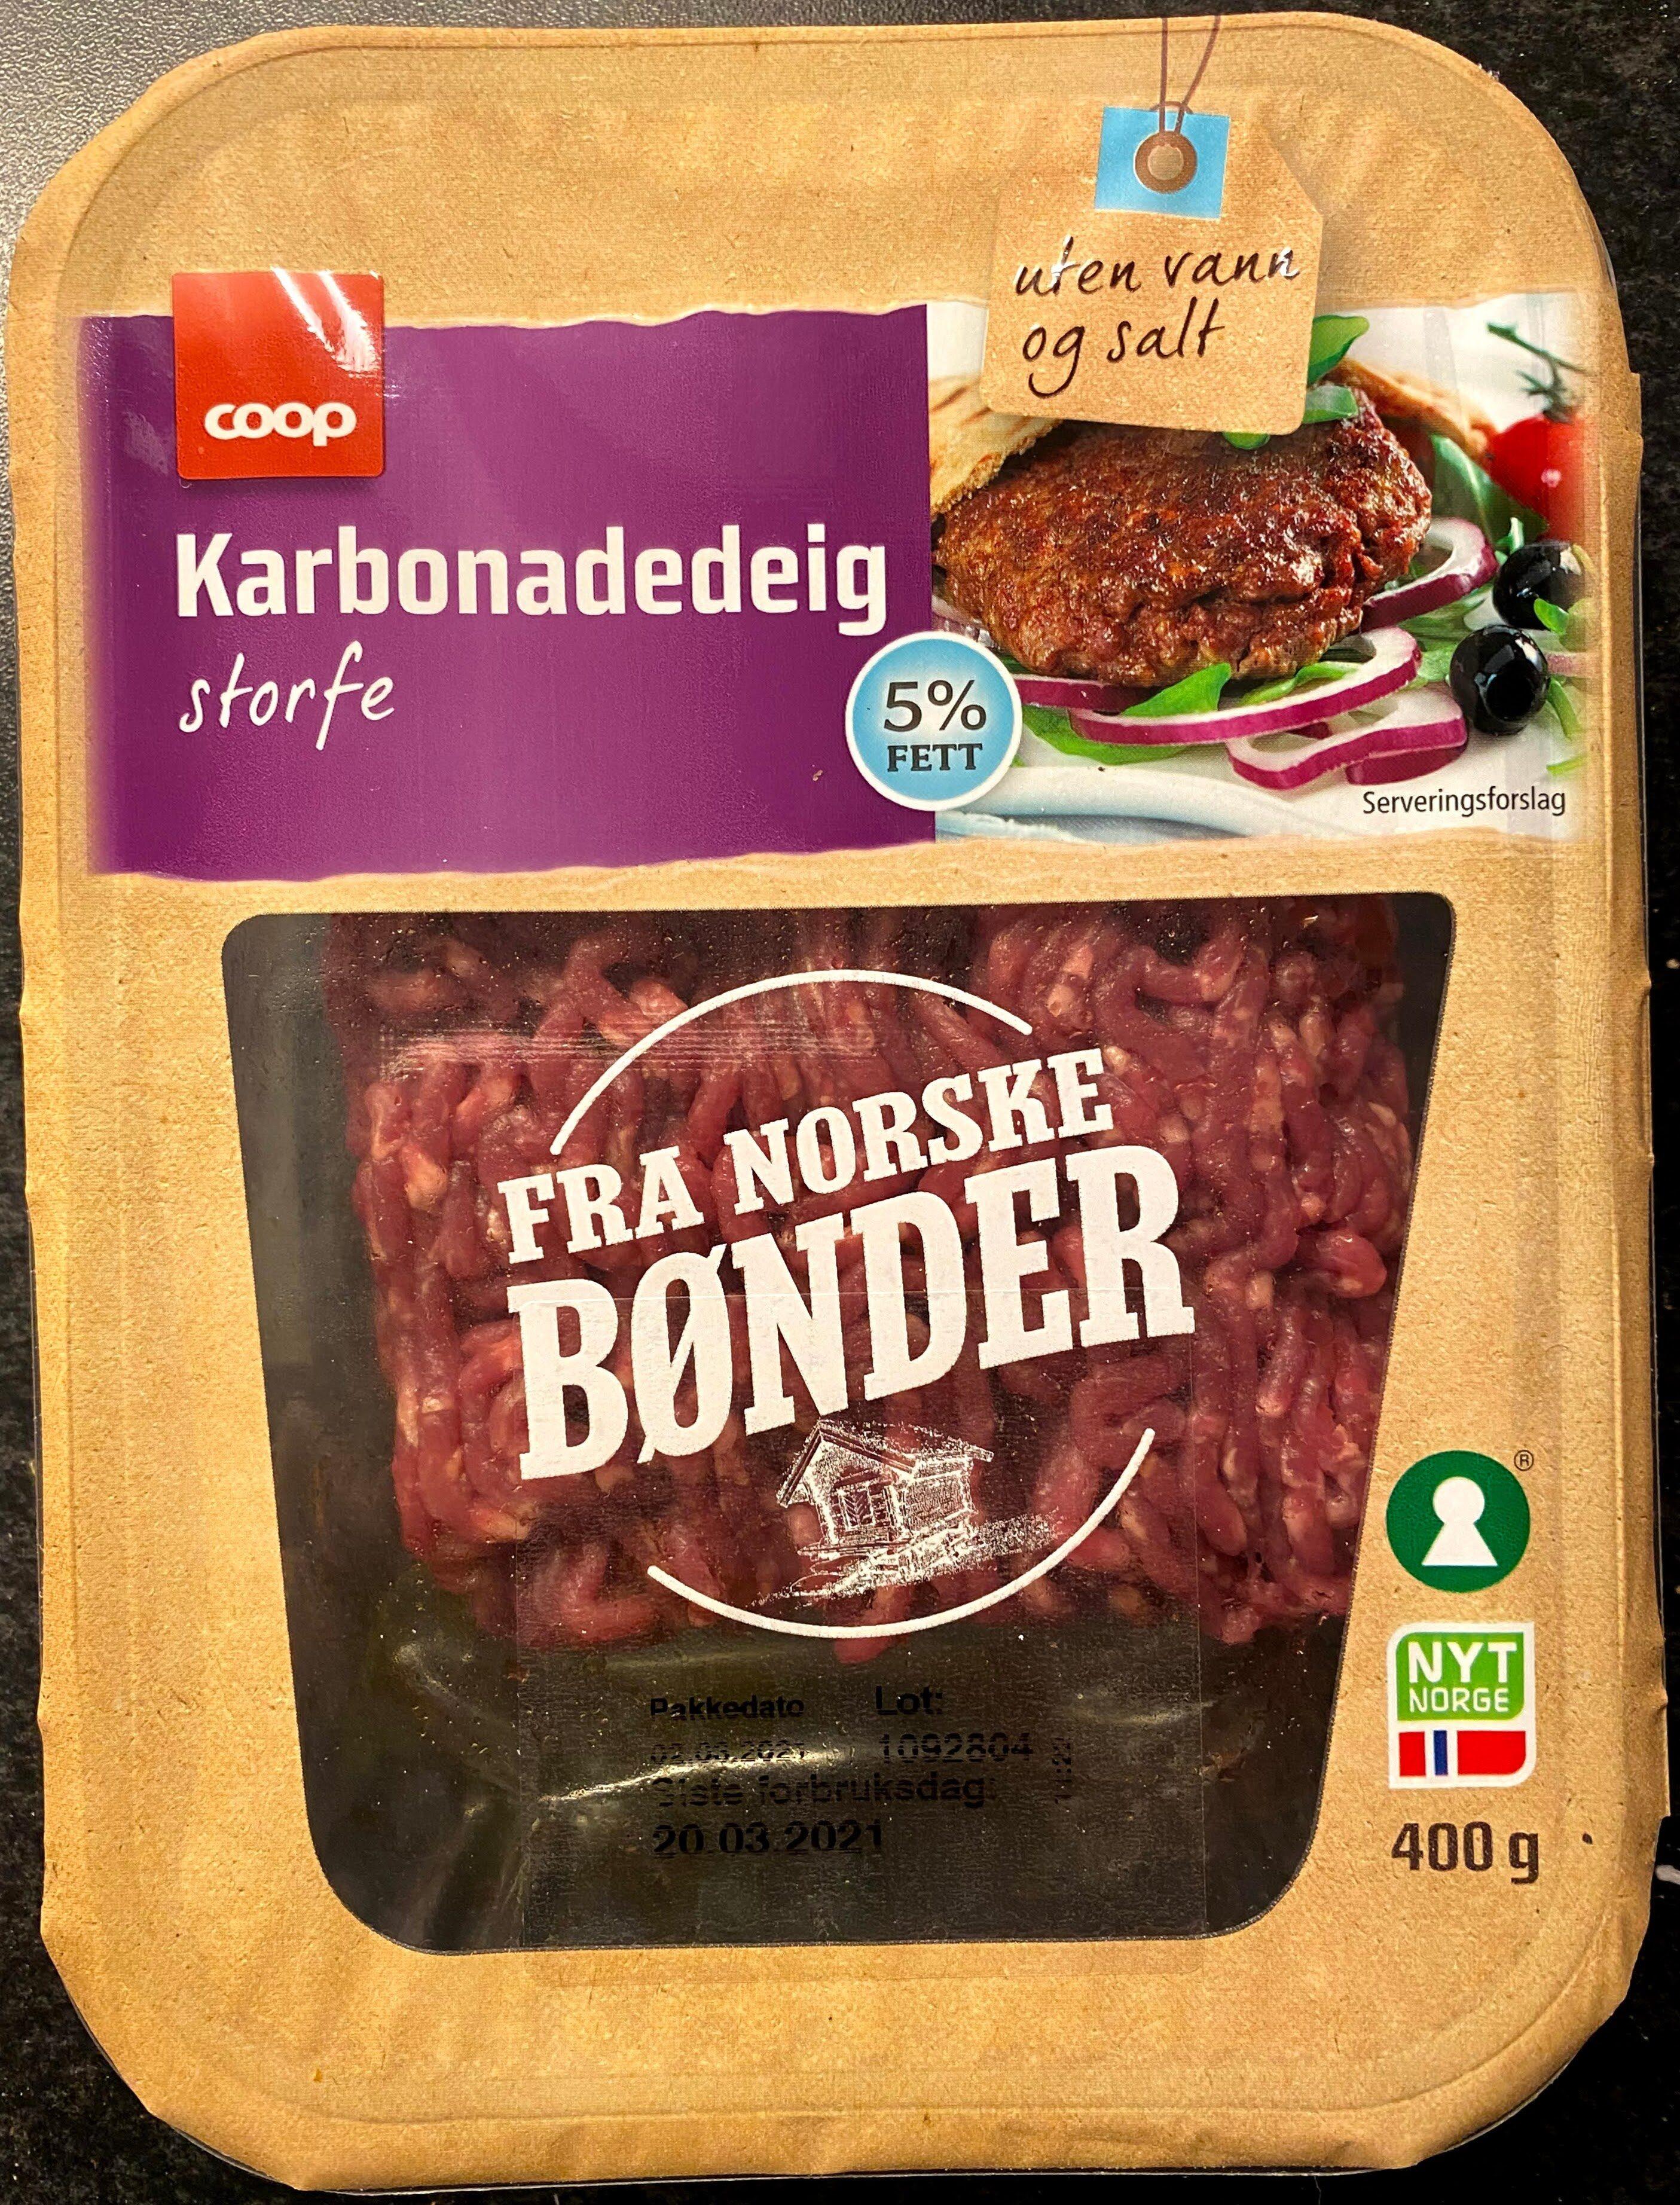 Karbonadedeig storfe - Produit - en